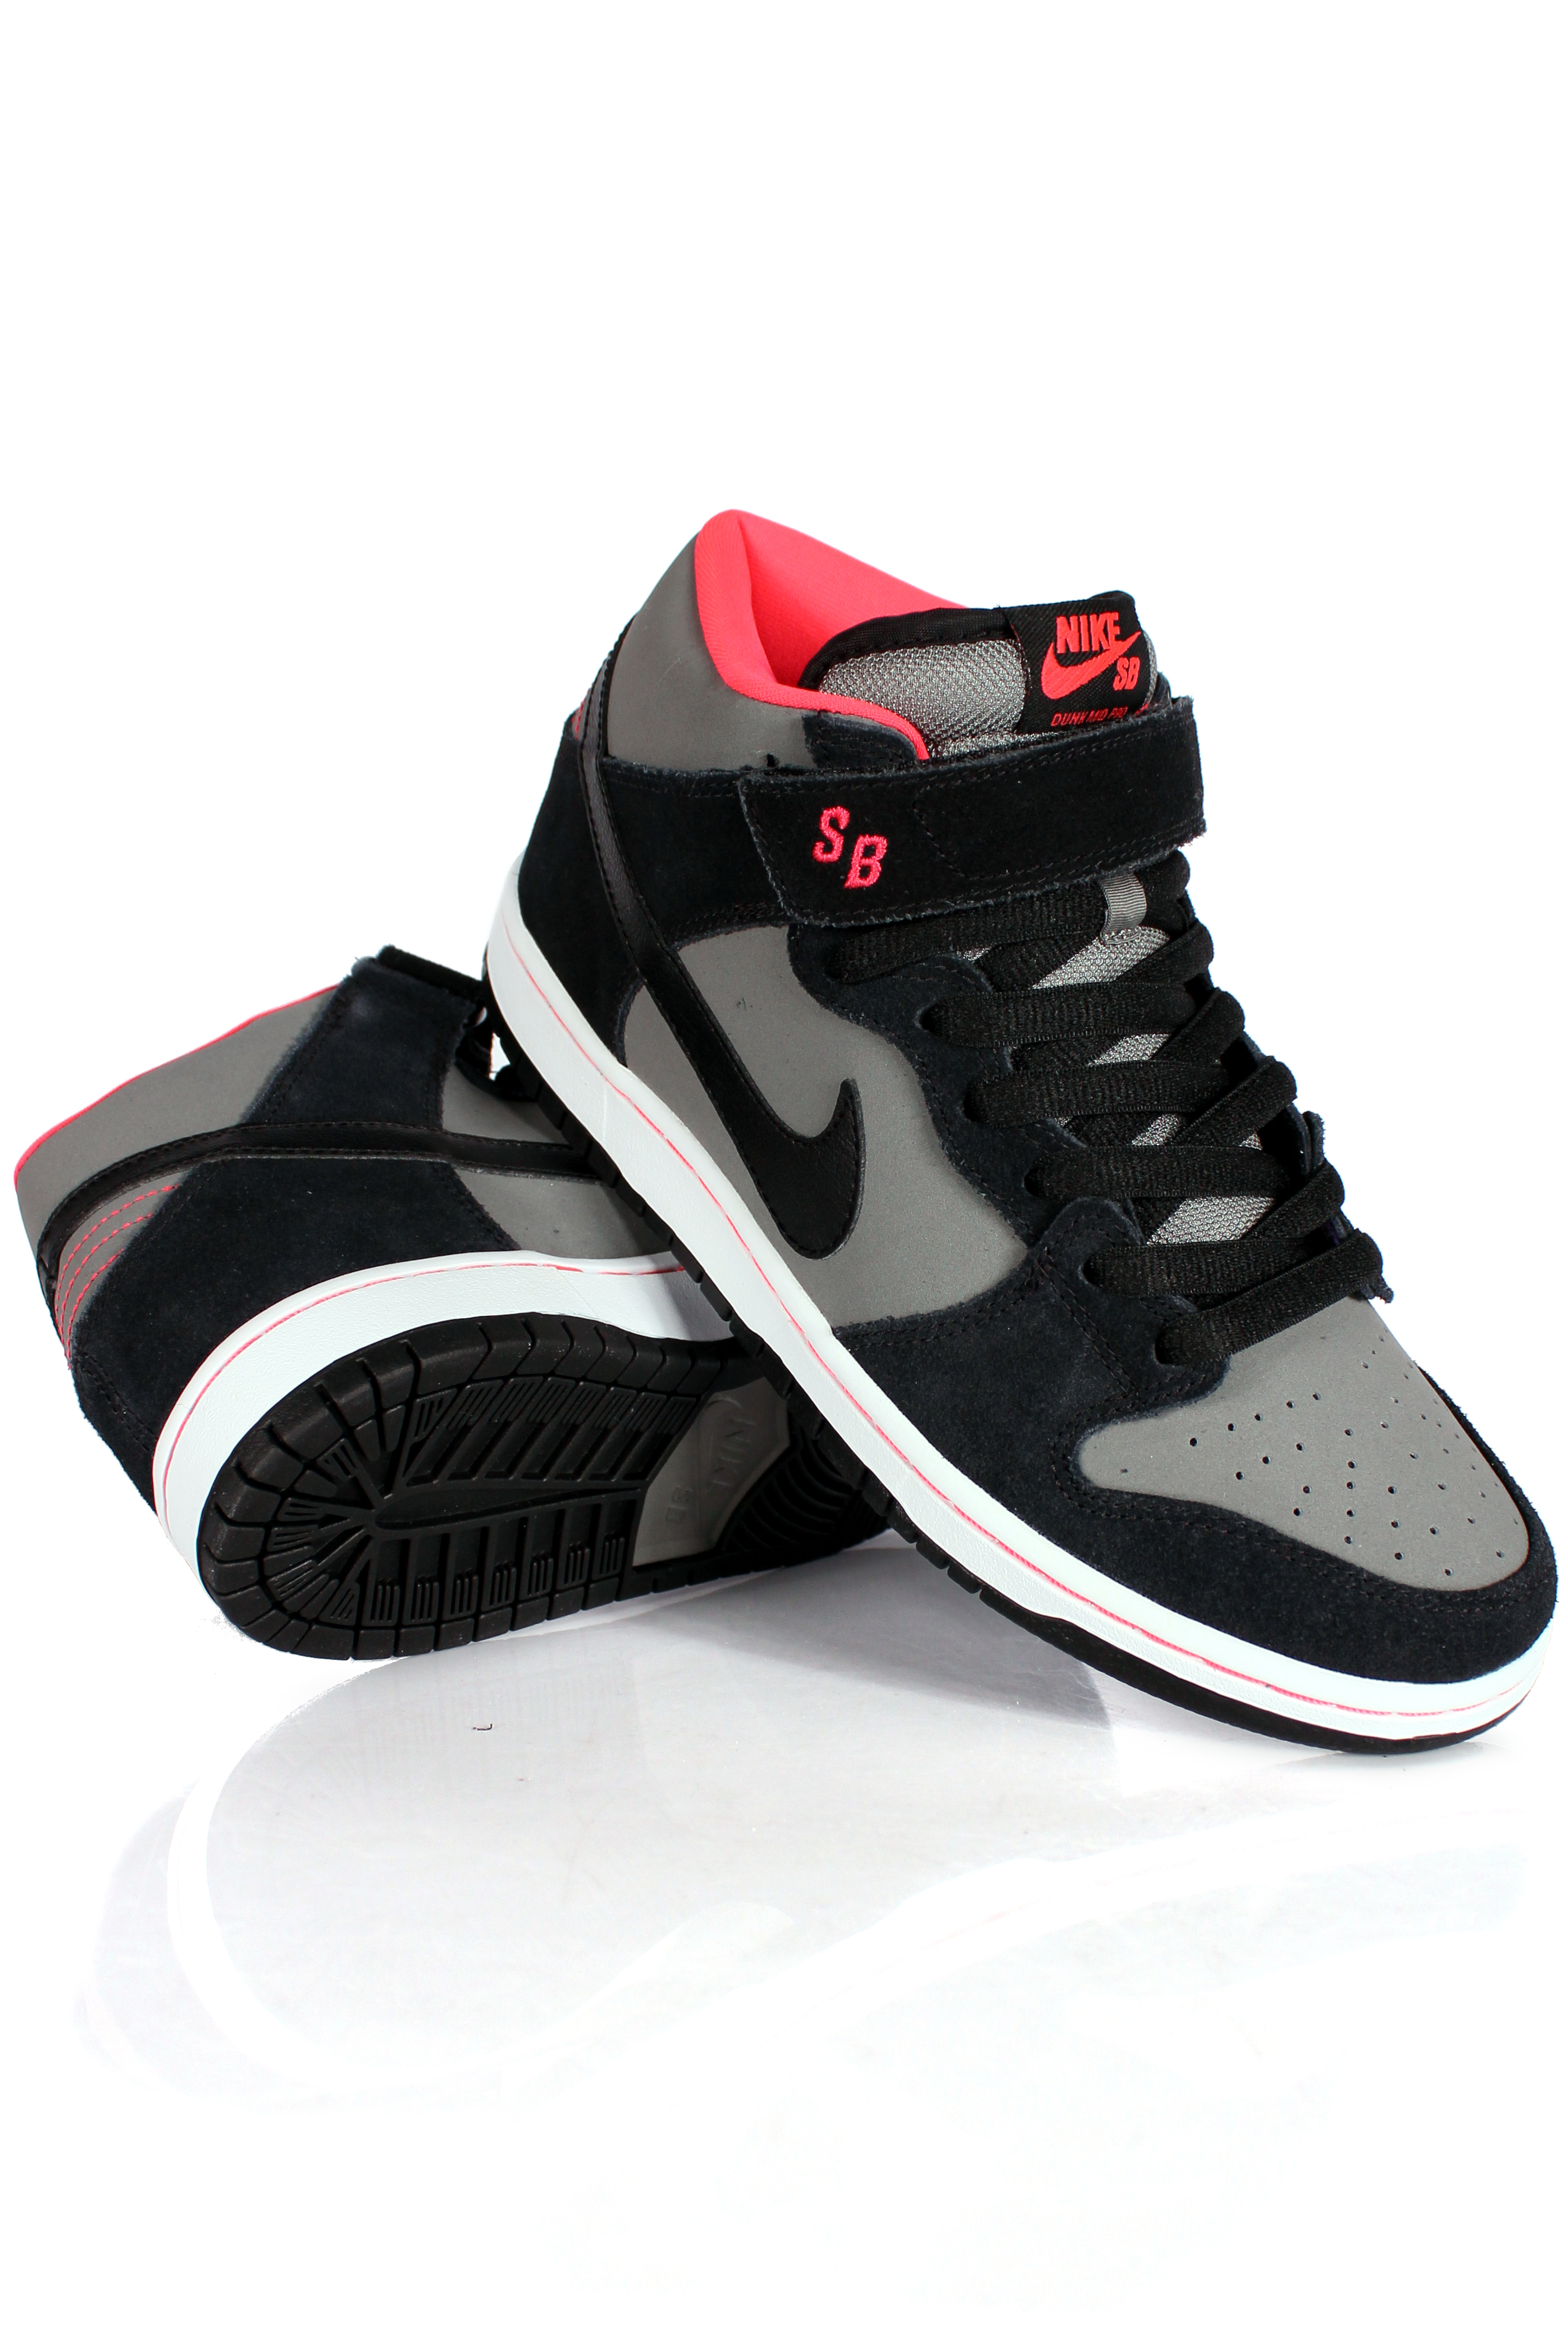 Buty Nike Dunk Mid Pro ( Black/Base Grey/Red)